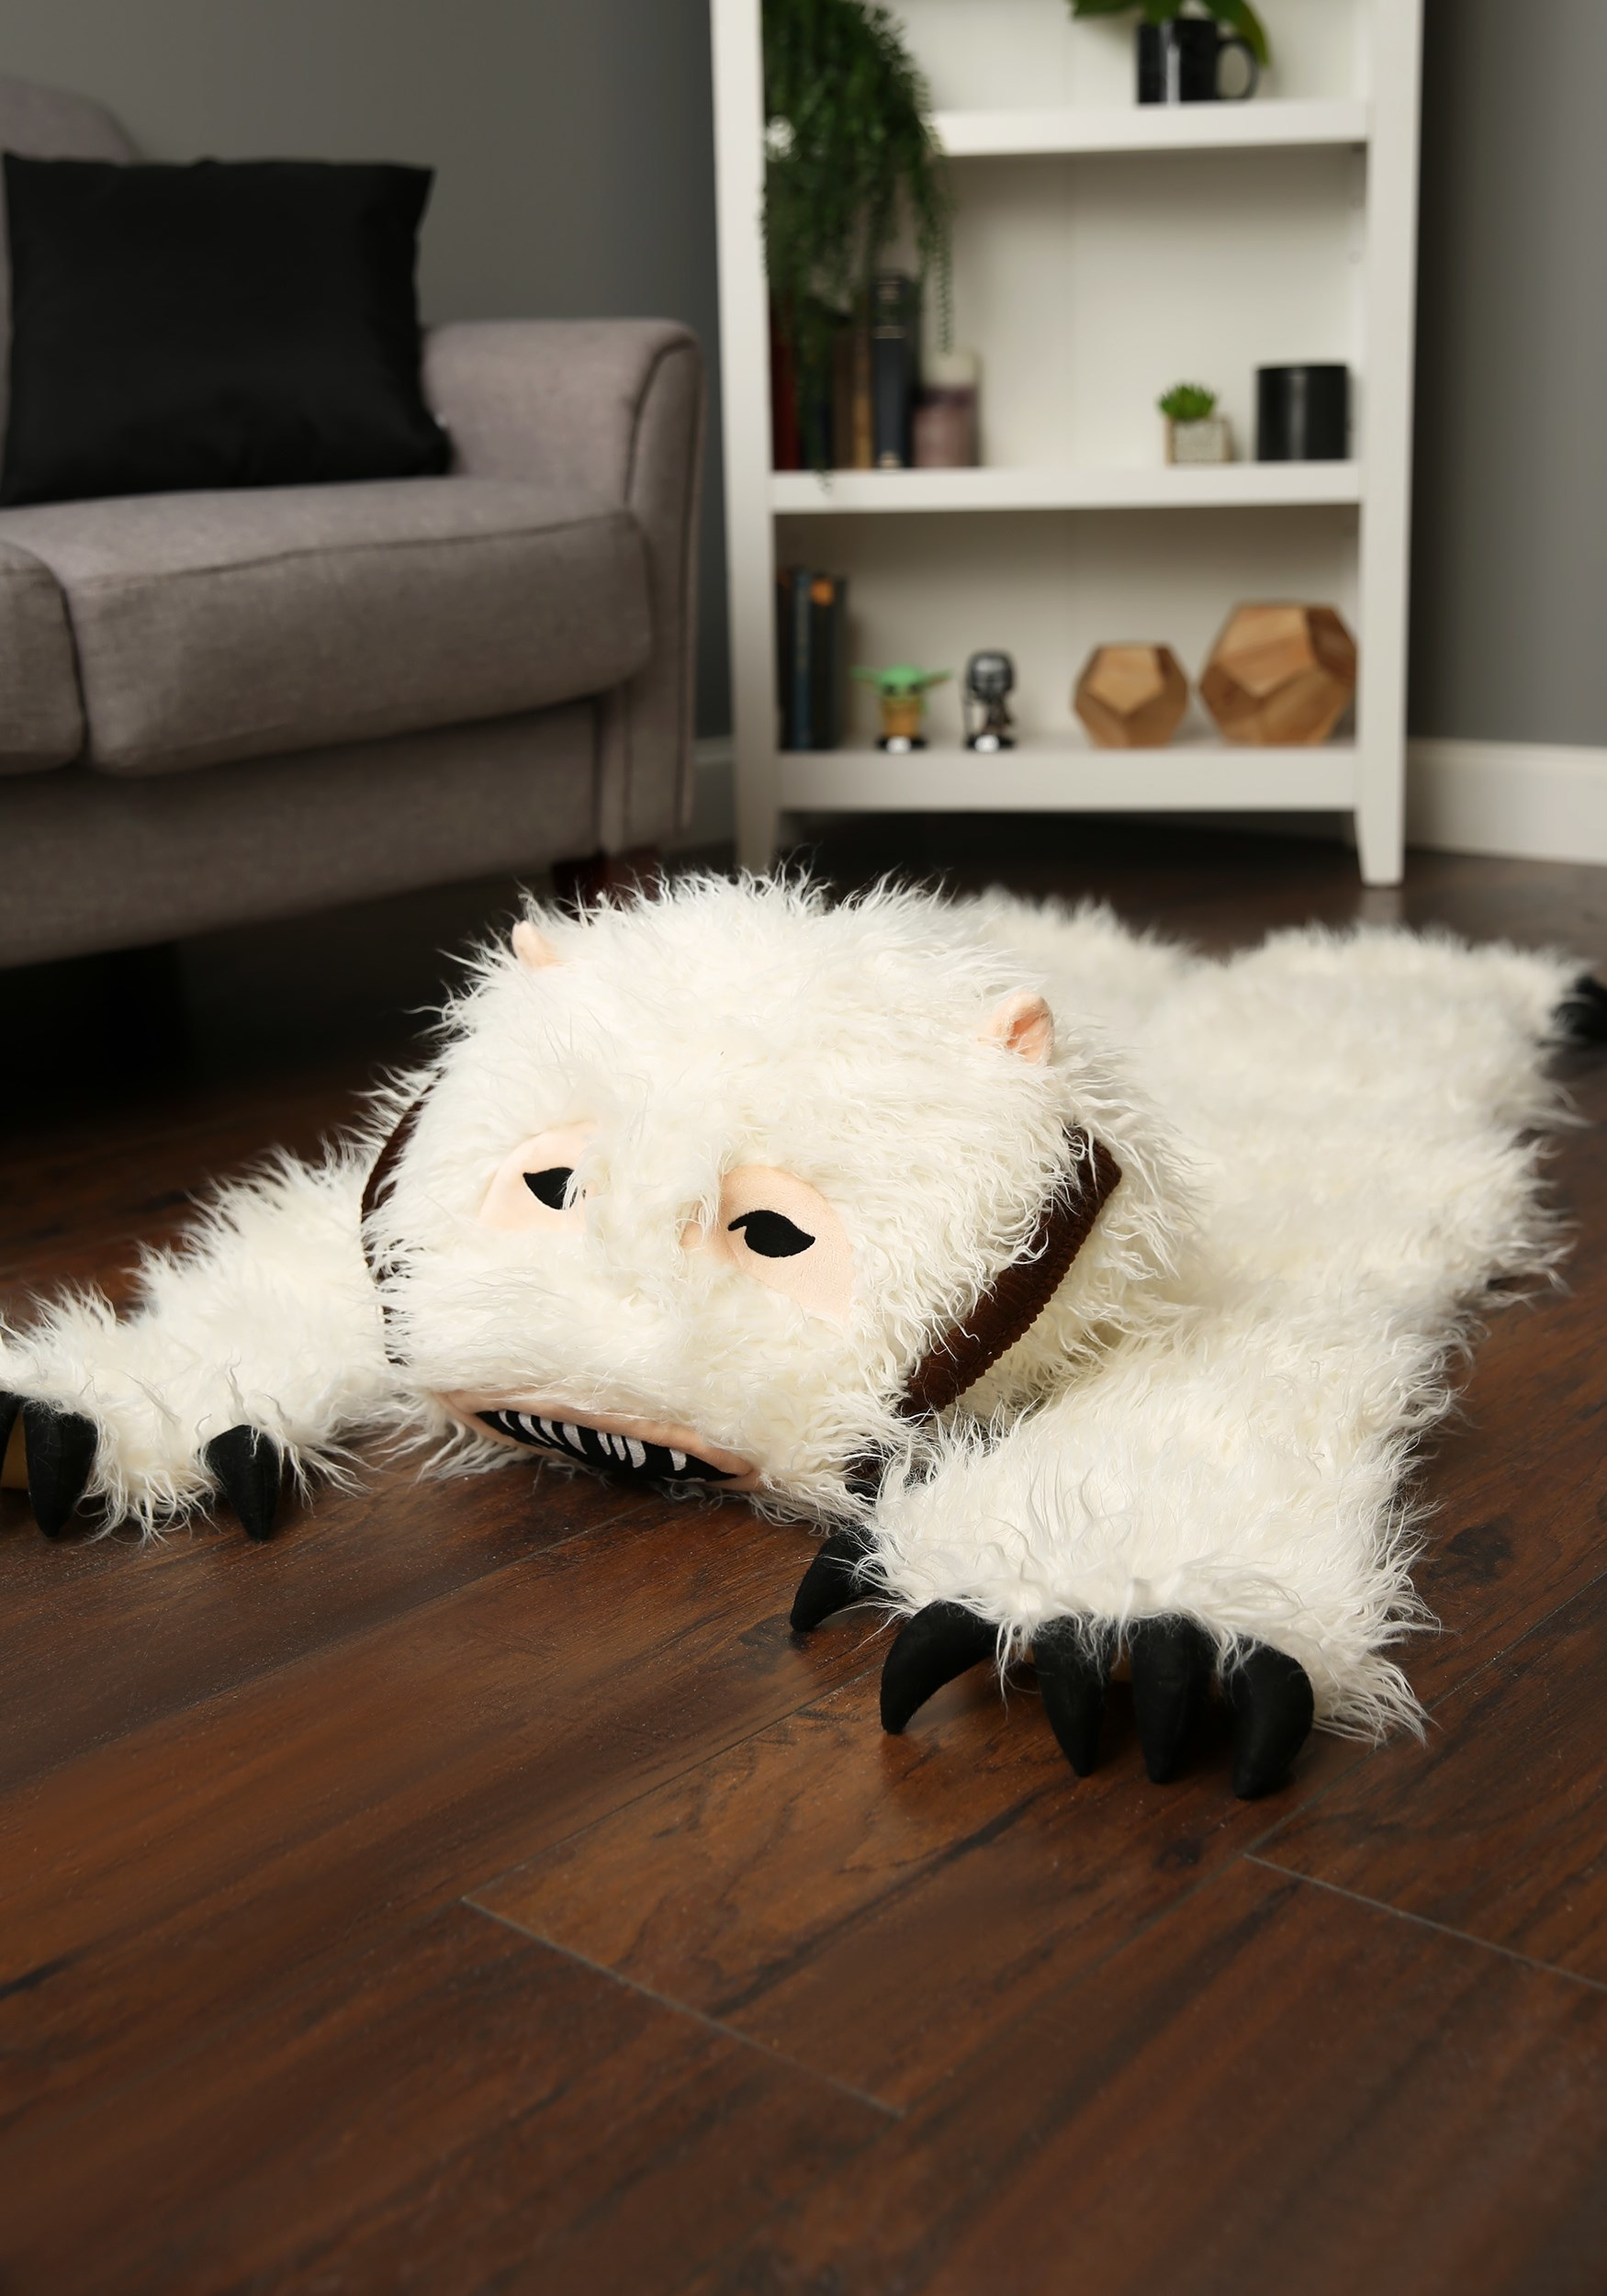 the white wampa rug